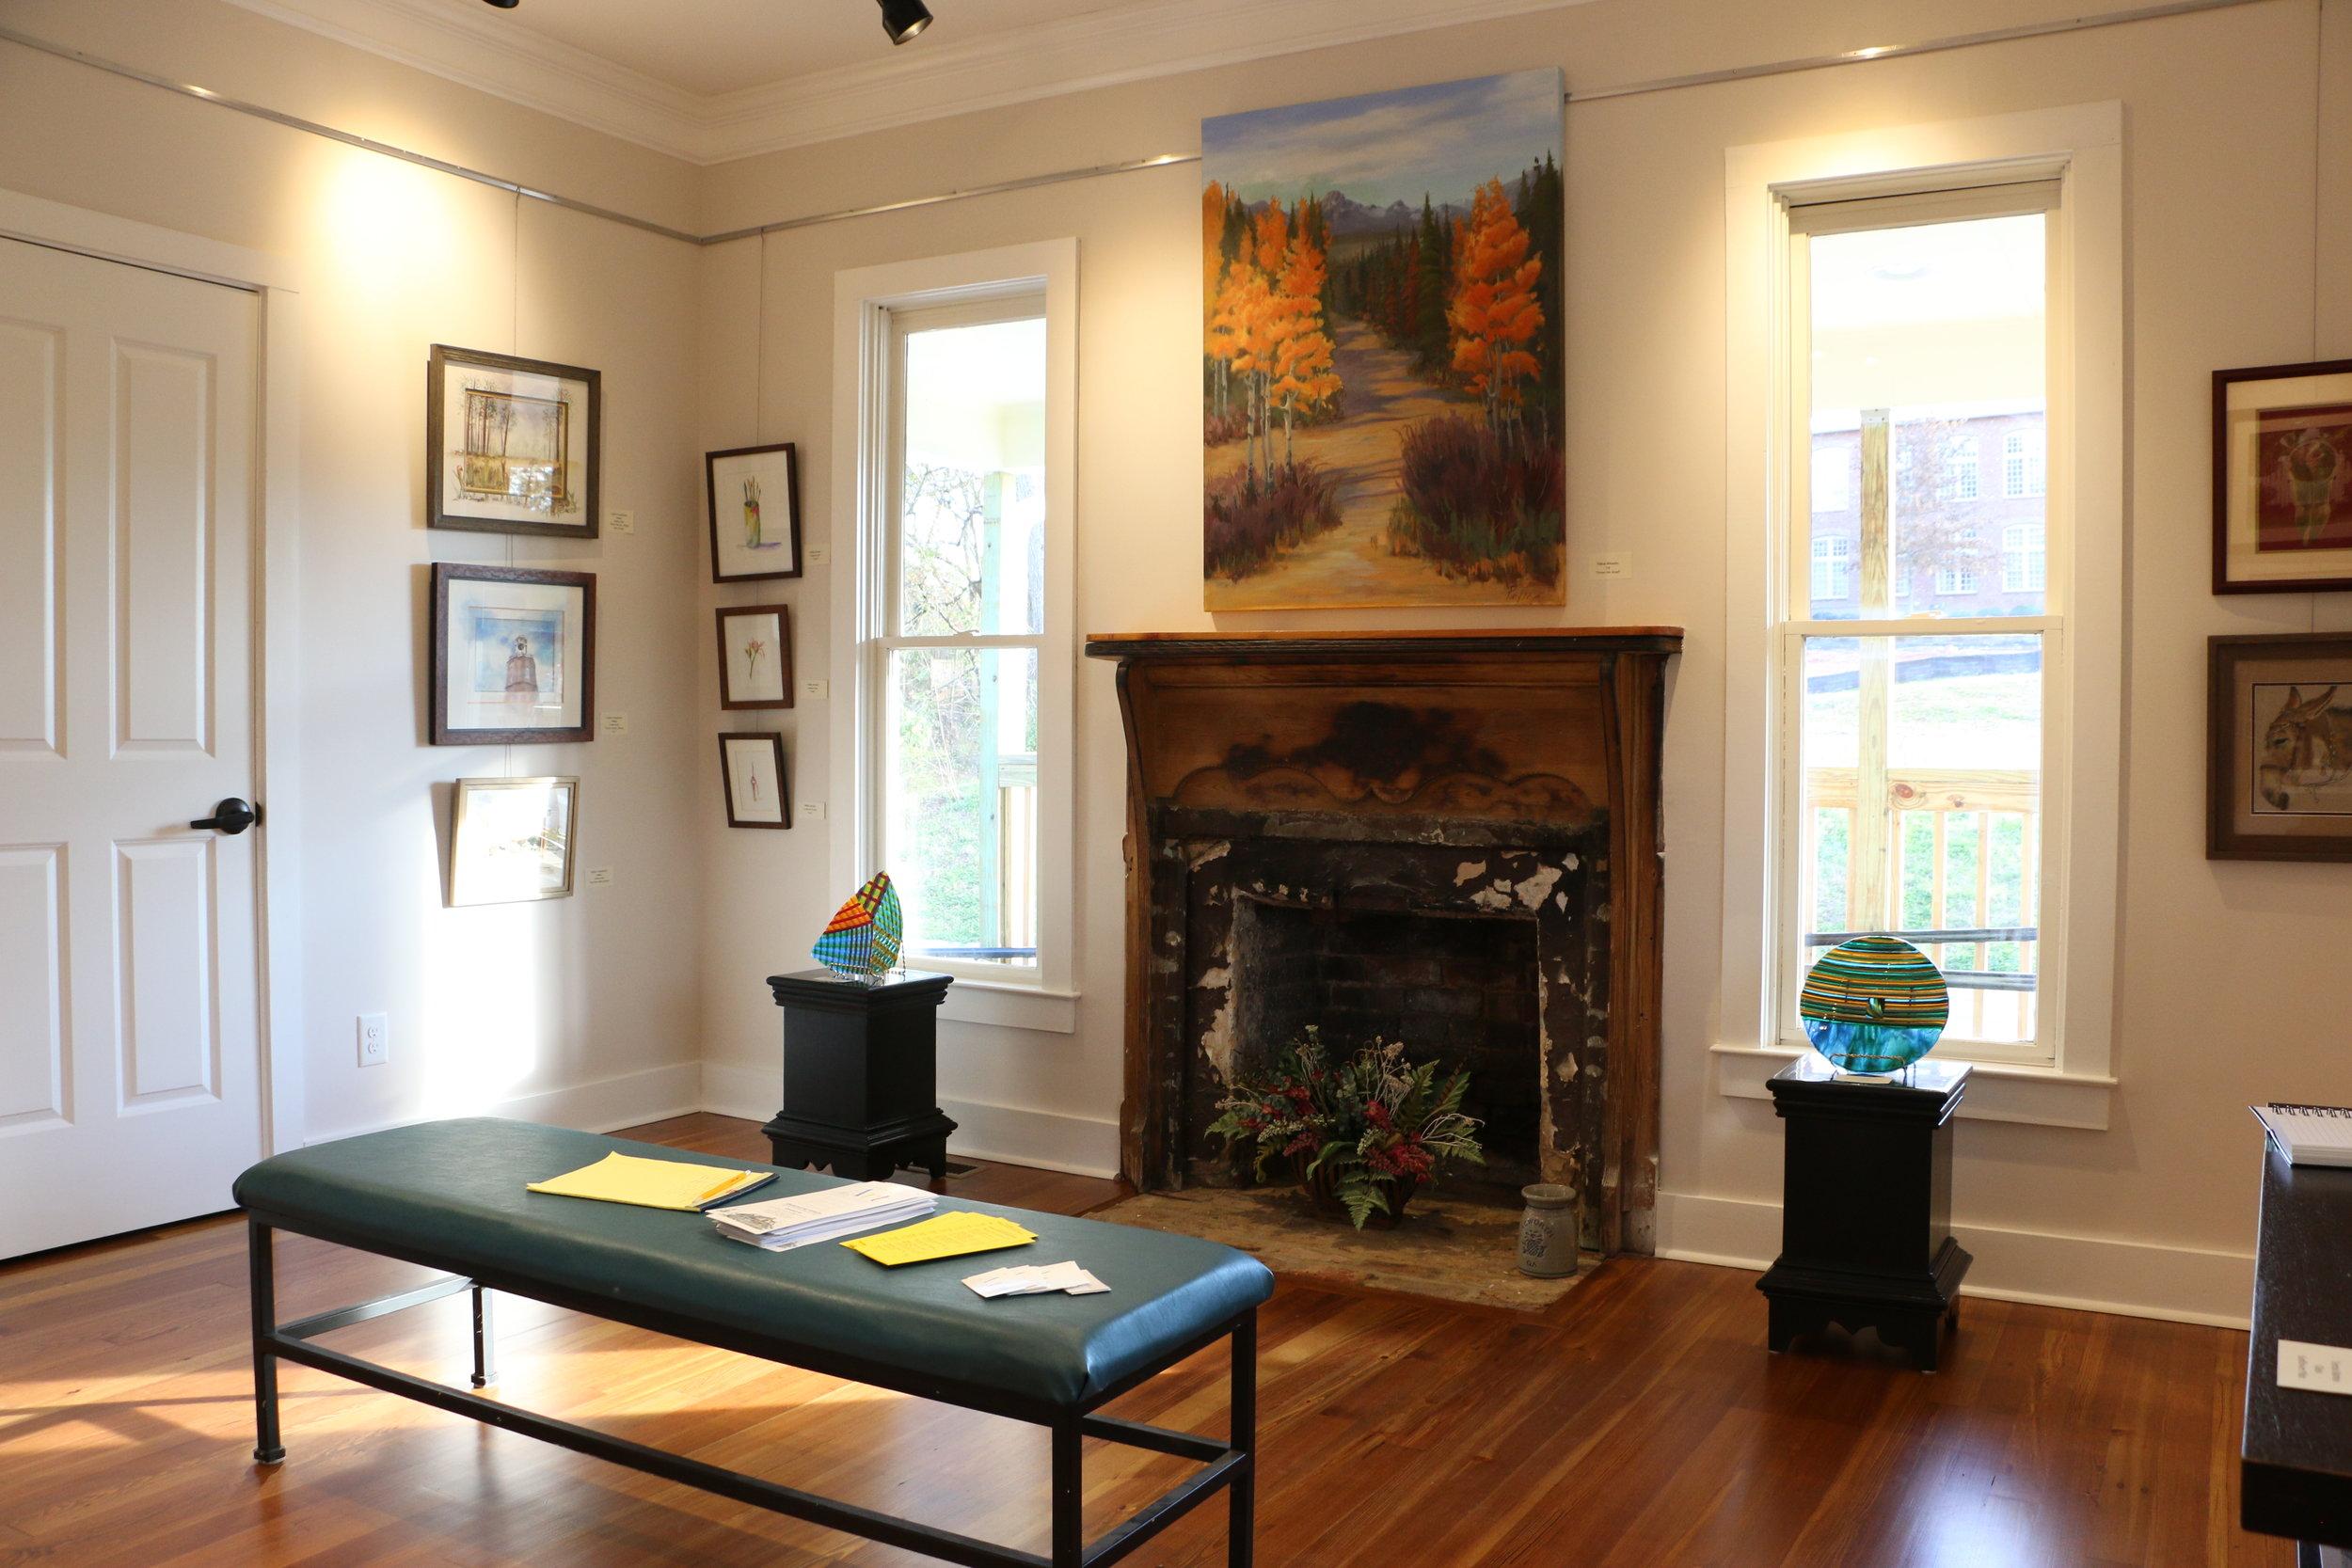 ART HOUSE AT LOGAN FARM -